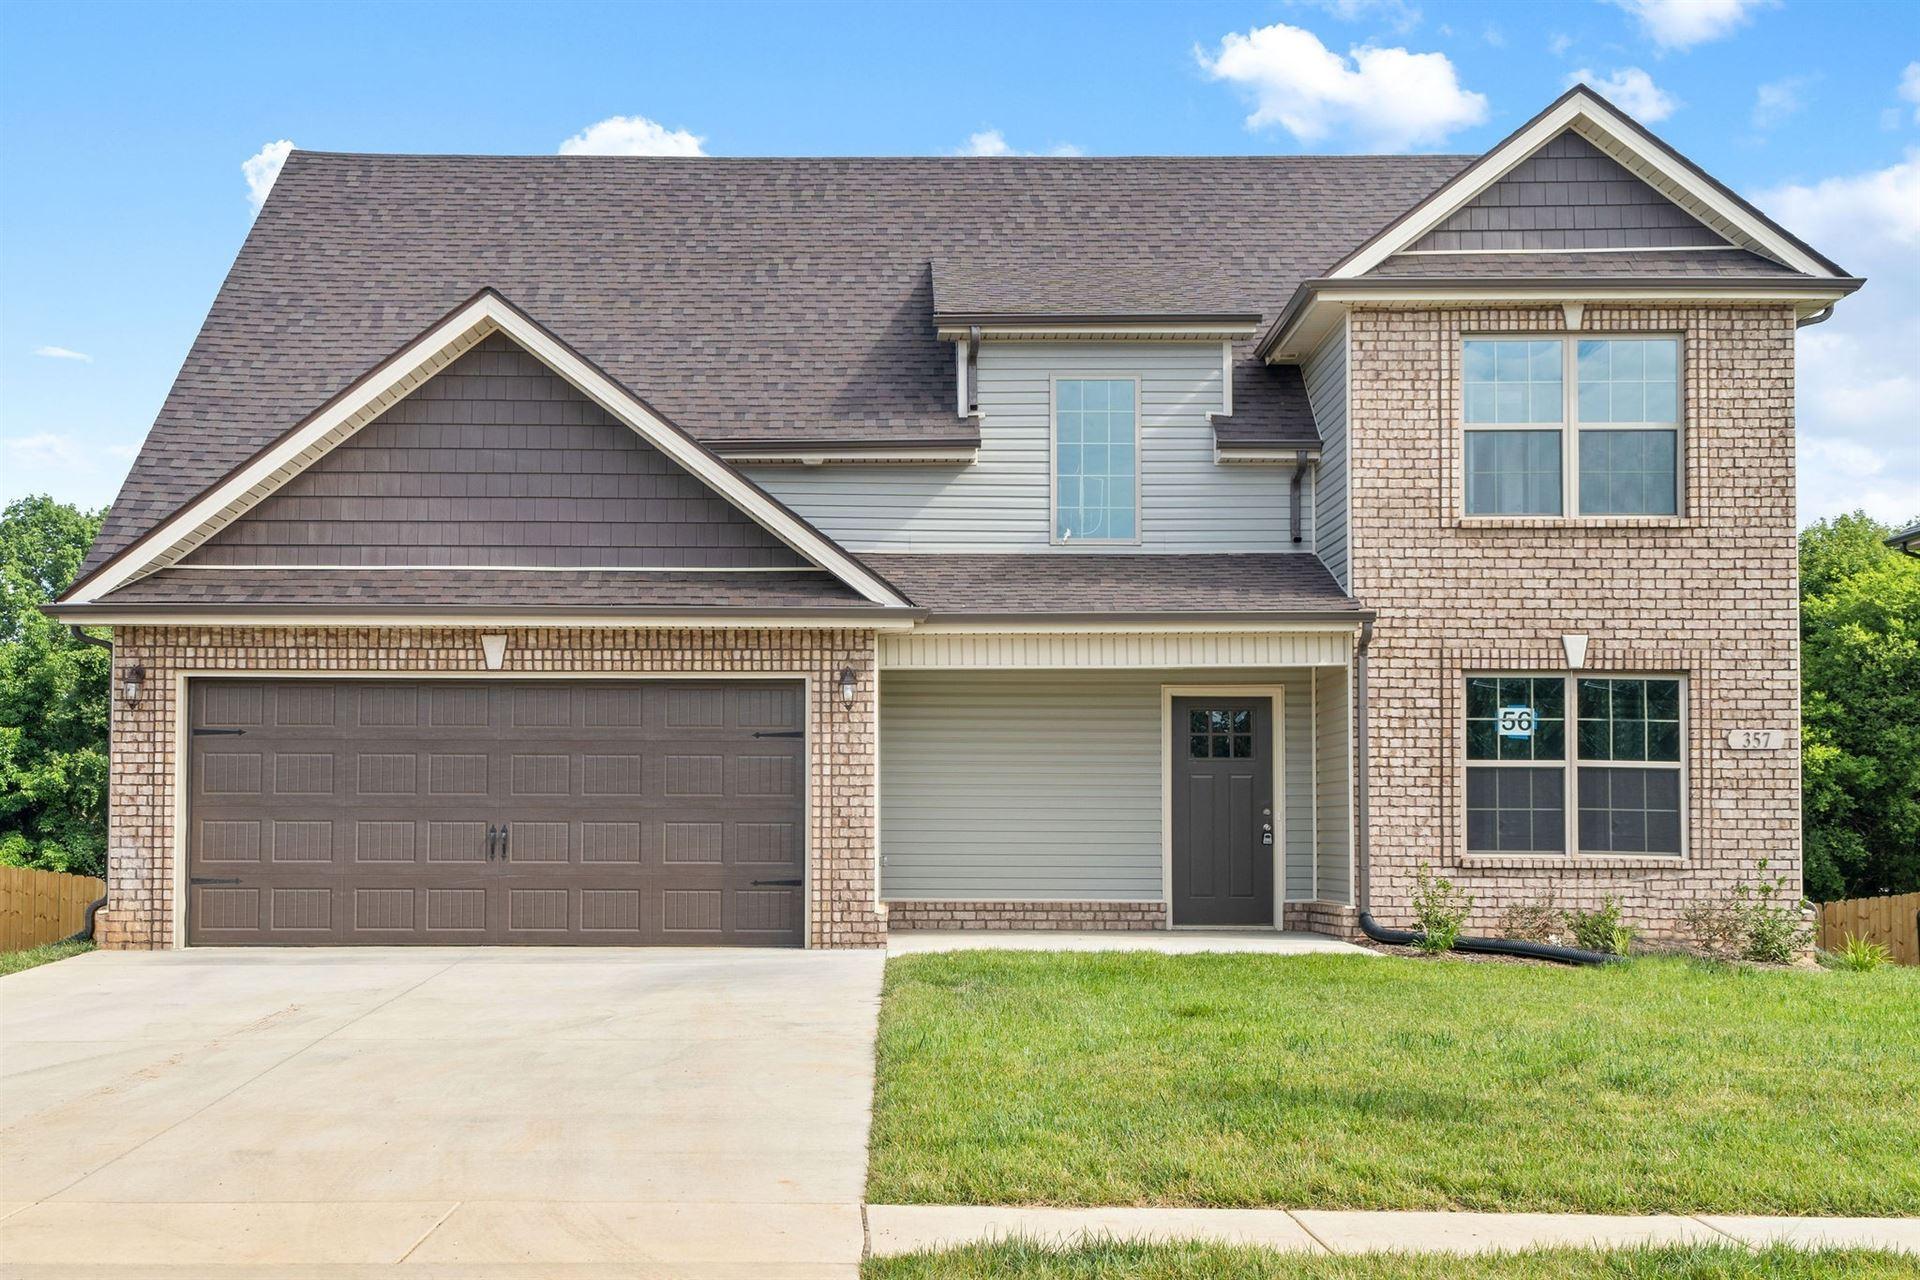 95 Dunbar, Clarksville, TN 37043 - MLS#: 2220507